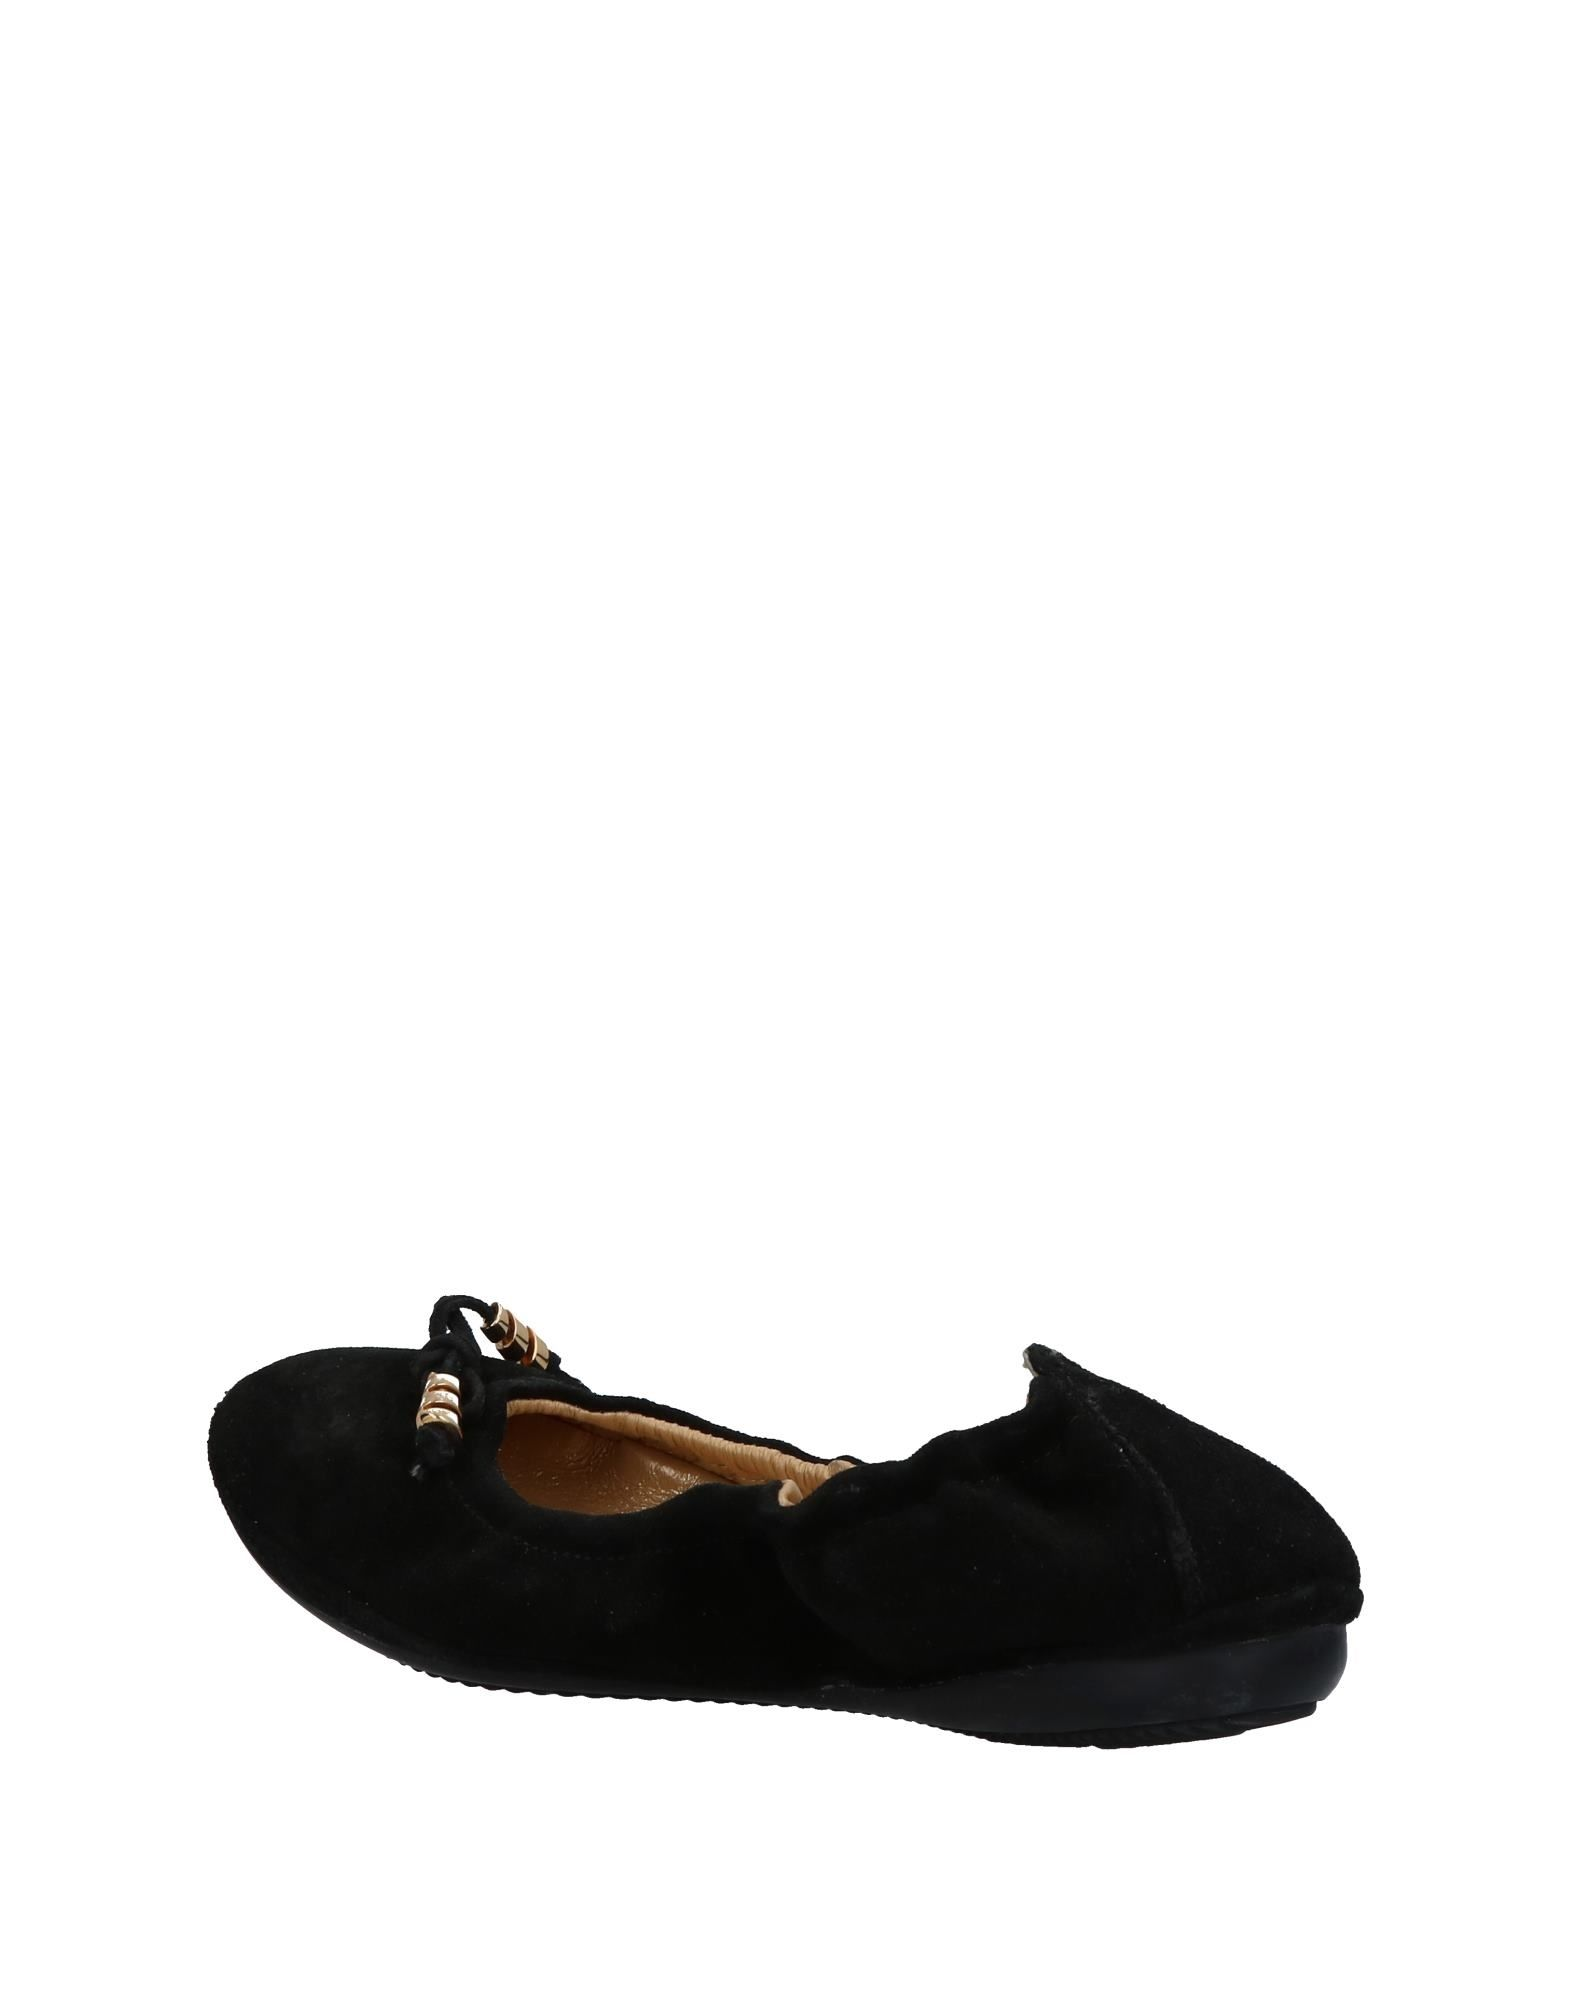 Stilvolle billige Schuhe Roberto Botticelli Ballerinas Damen Damen Damen 11375786JA e6e5f9